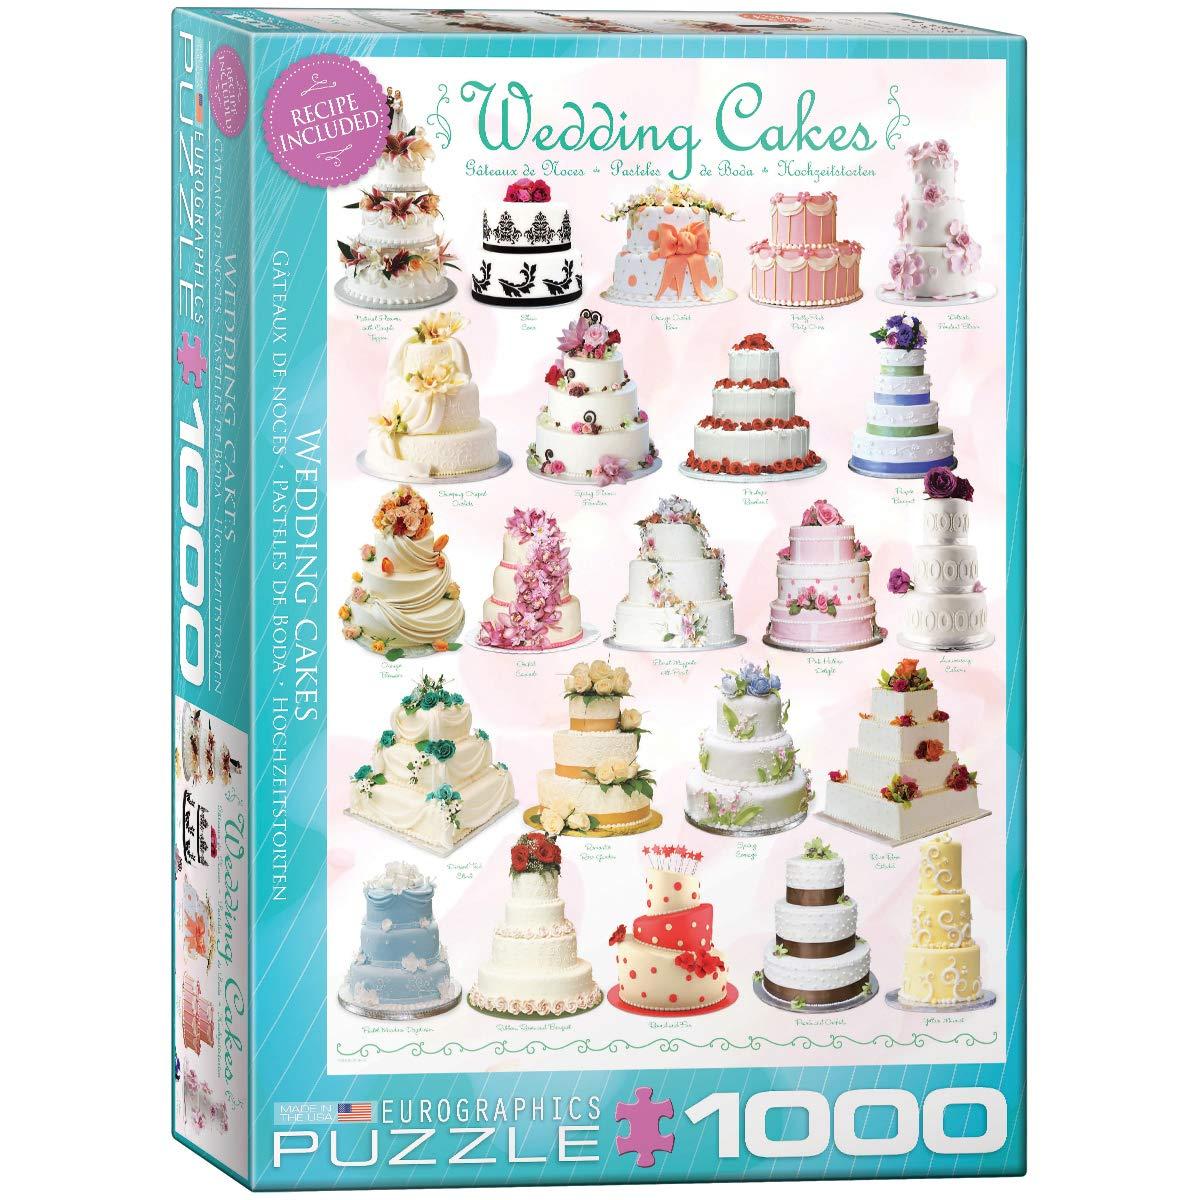 Eurographics Wedding Cakes 1000-Piece Puzzle